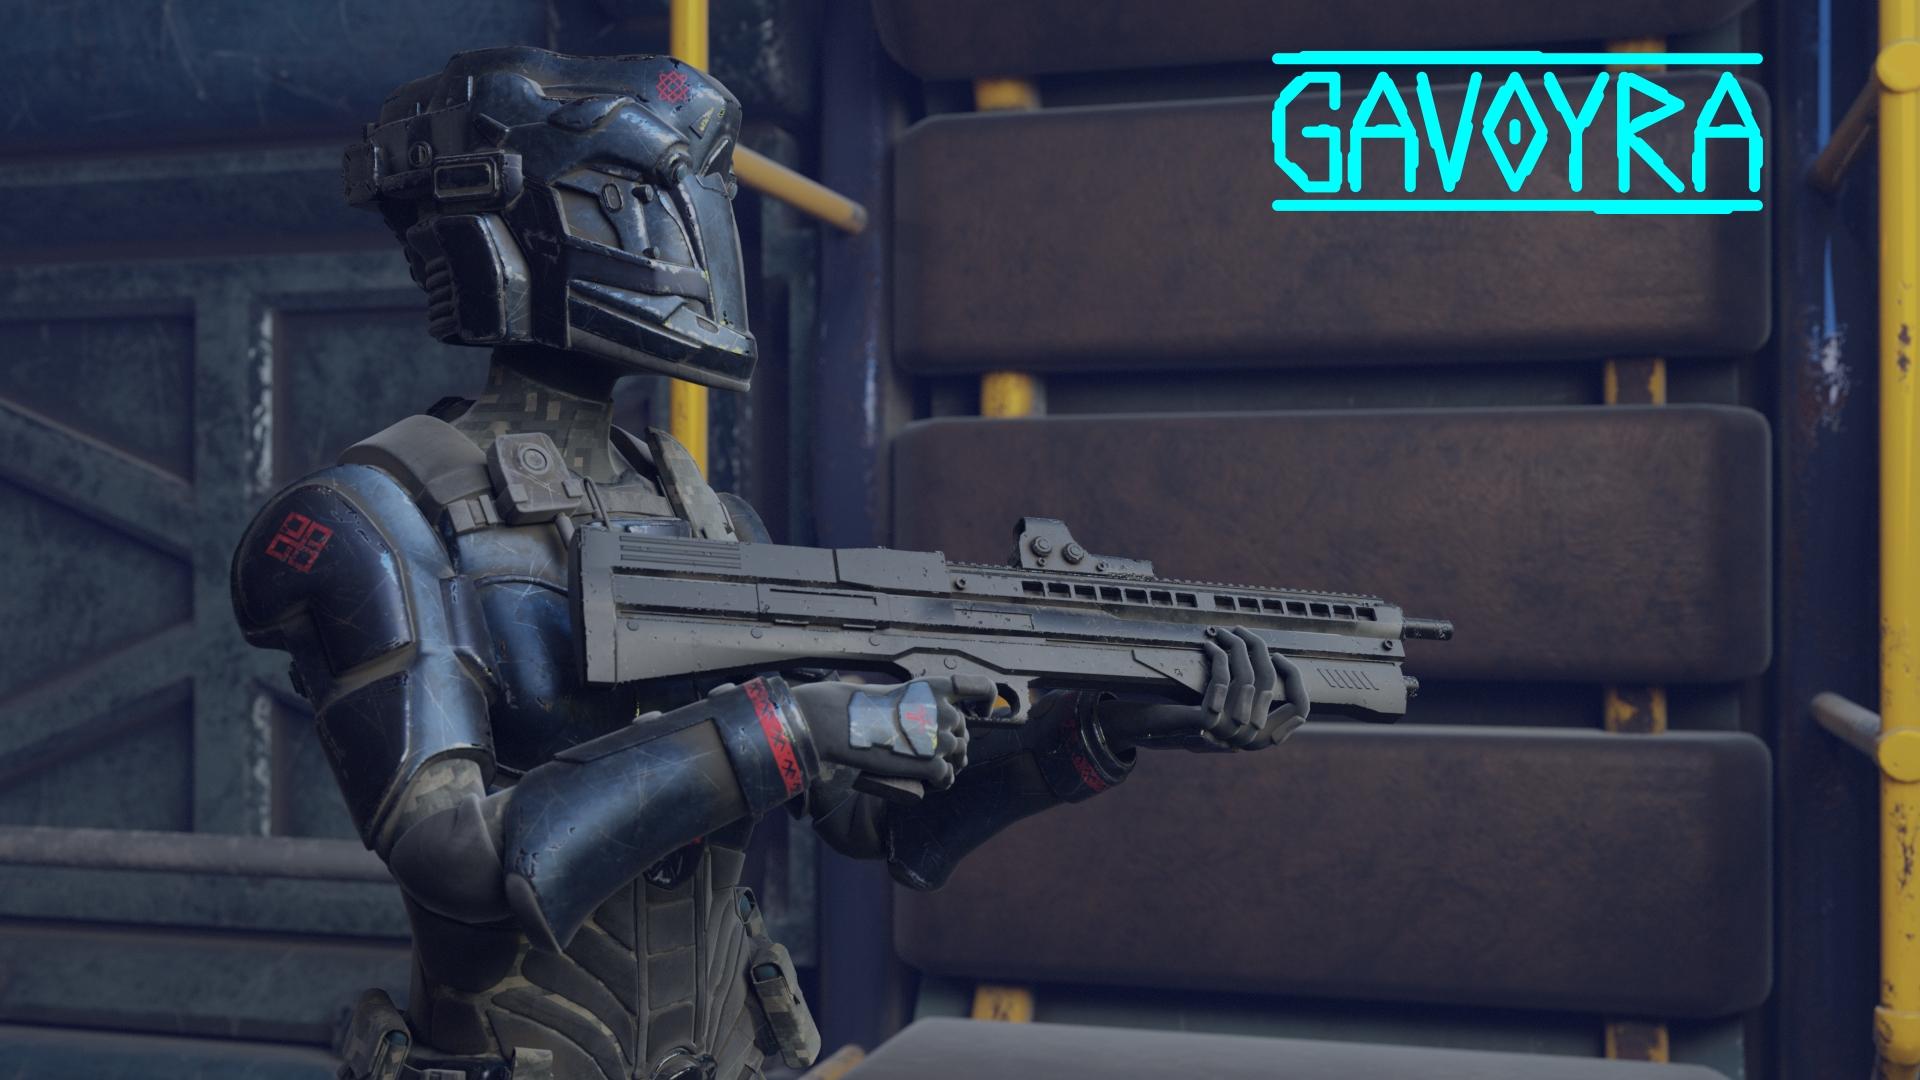 Gavoyra